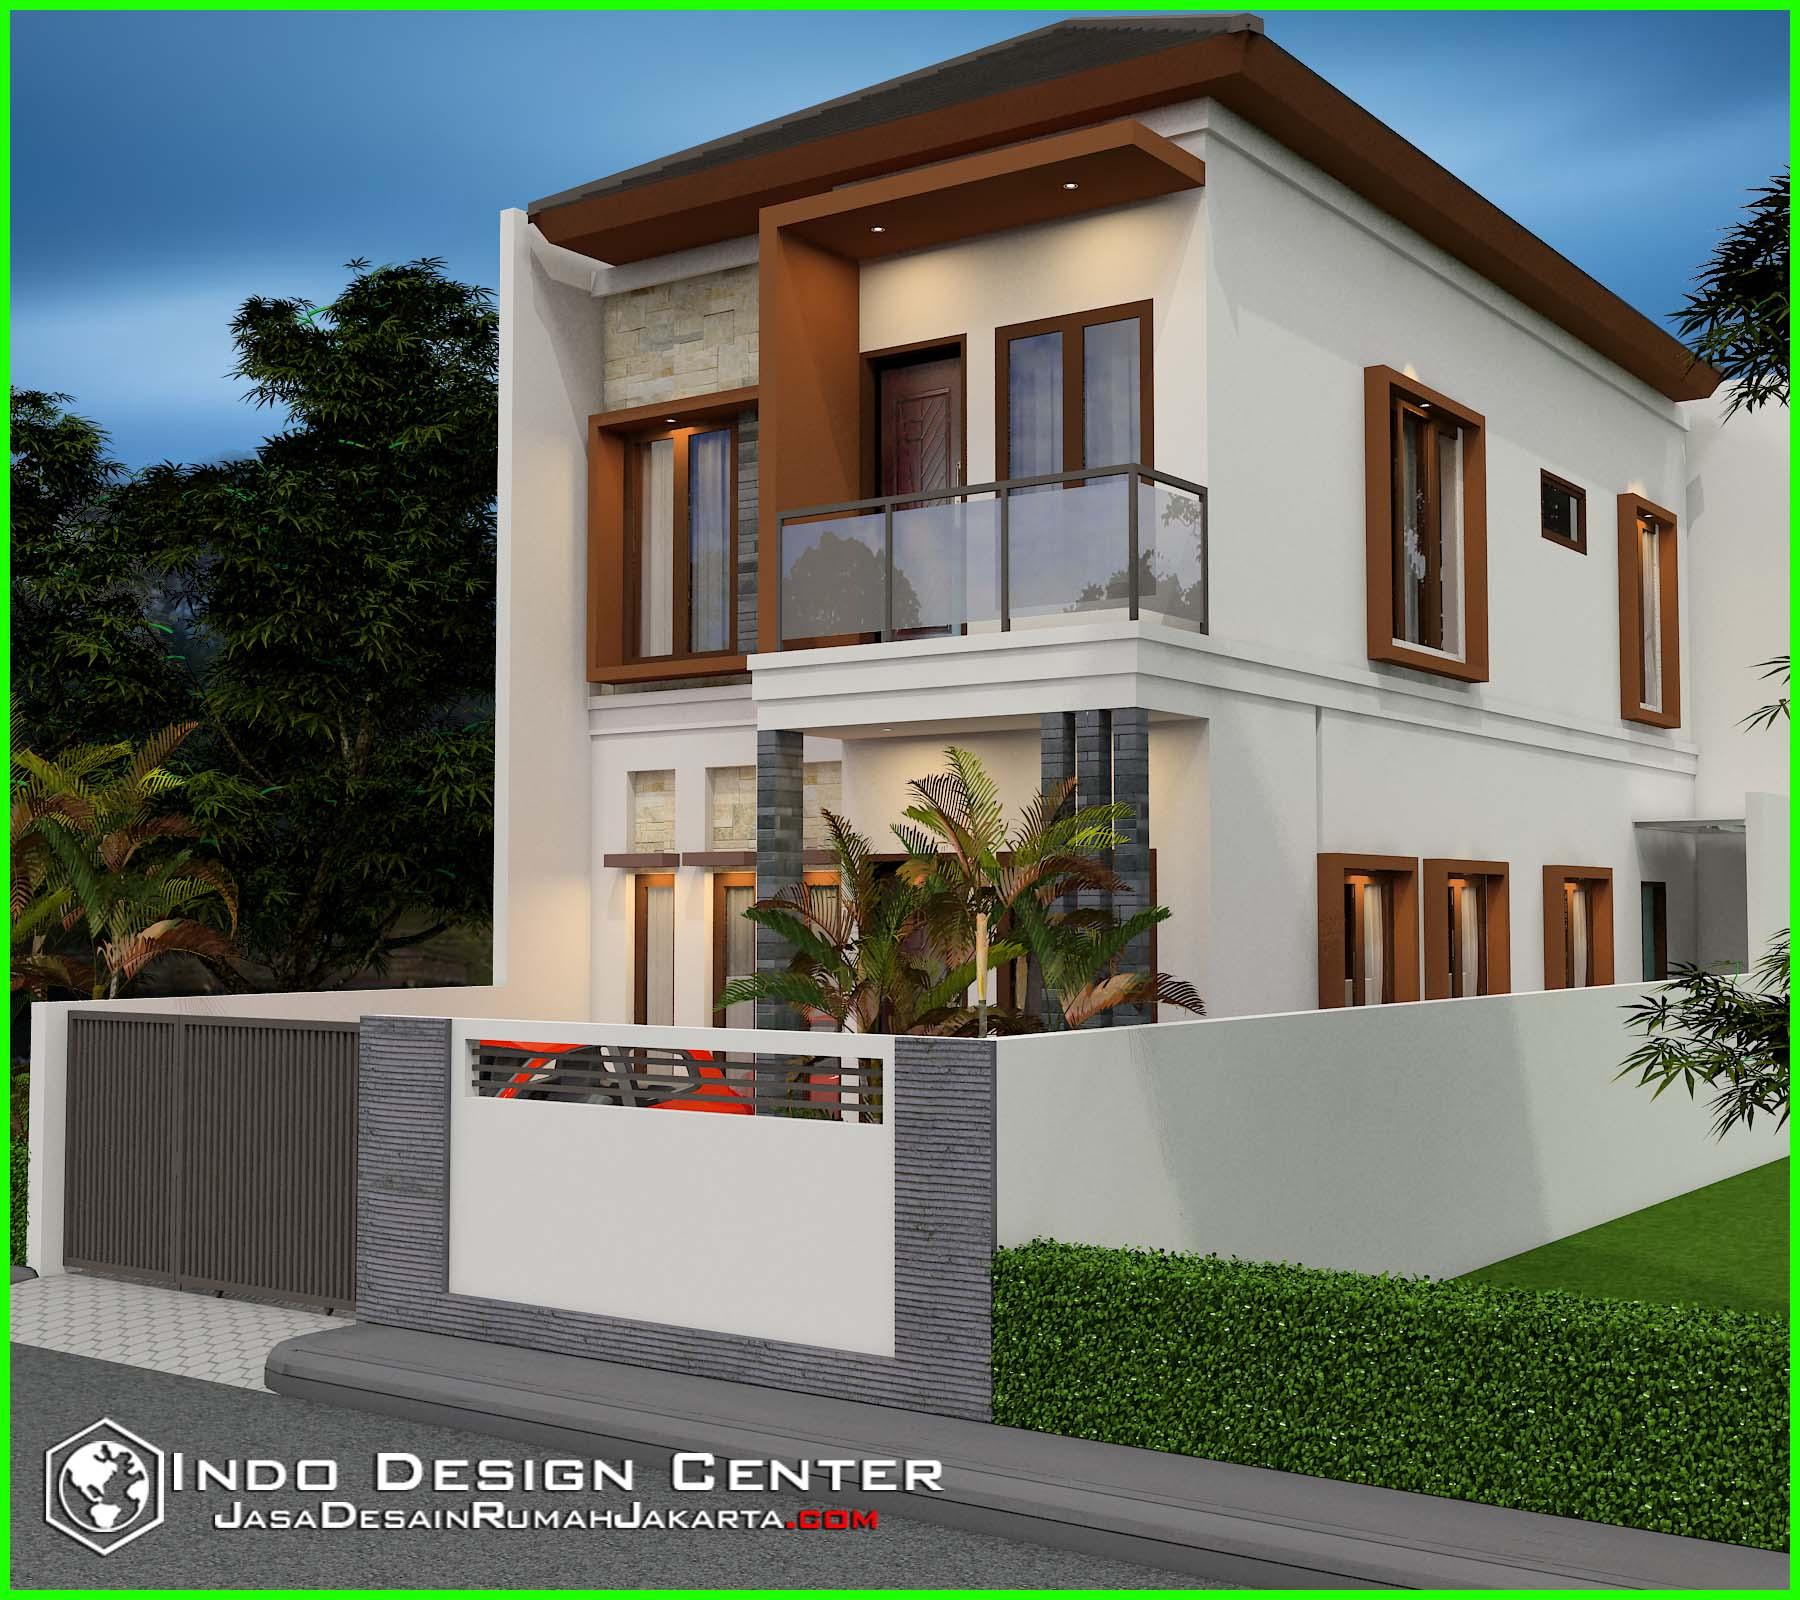 Rumah Minimalis Berkonsep Villa Mewah Jasa Desain Rumah Jakarta